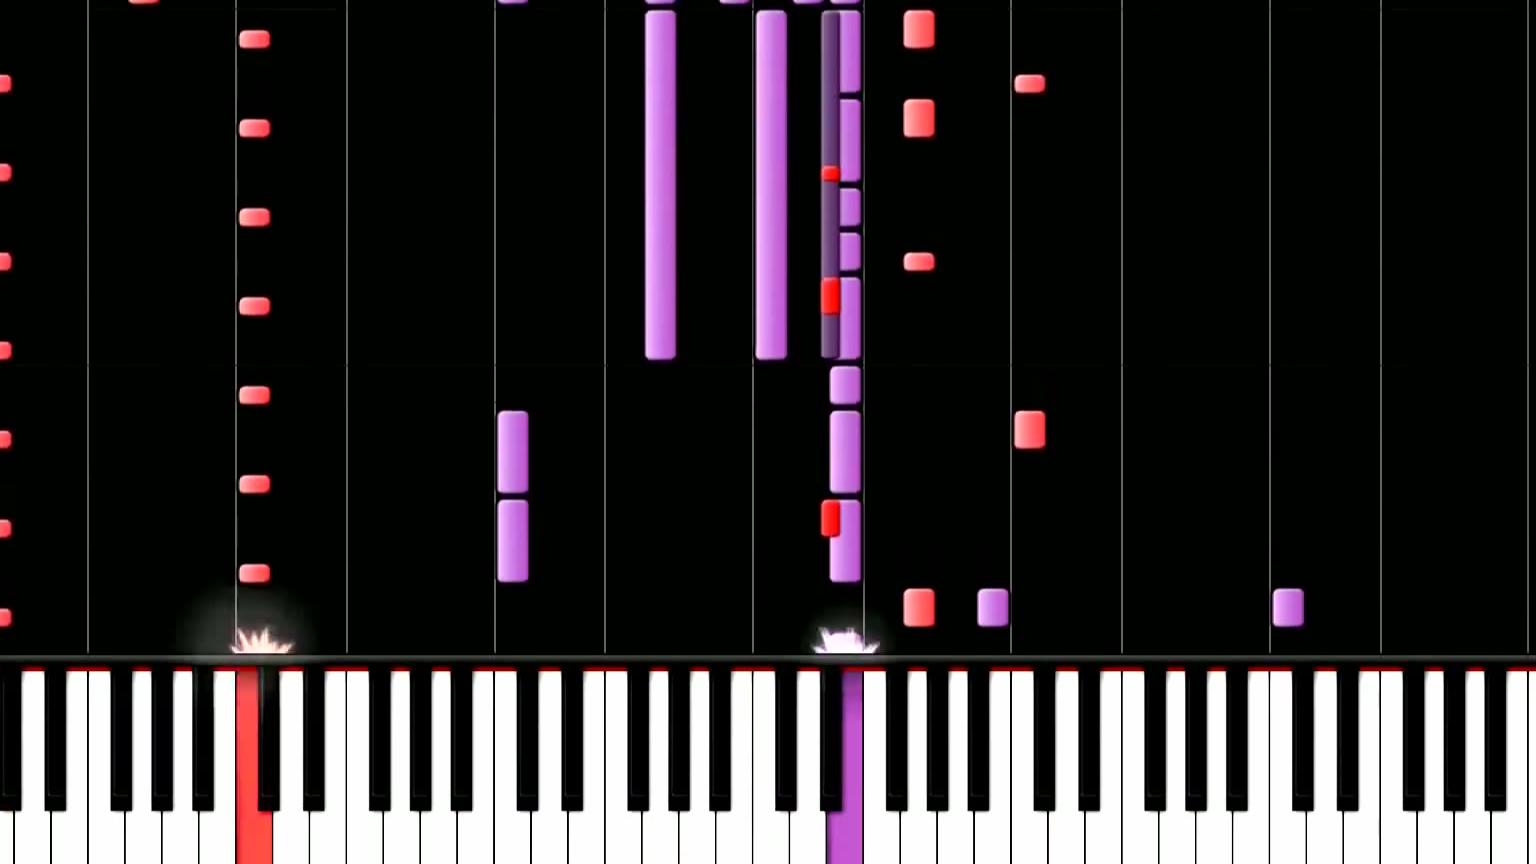 【Helltaker OST】Vitality - Mittsies 钢琴